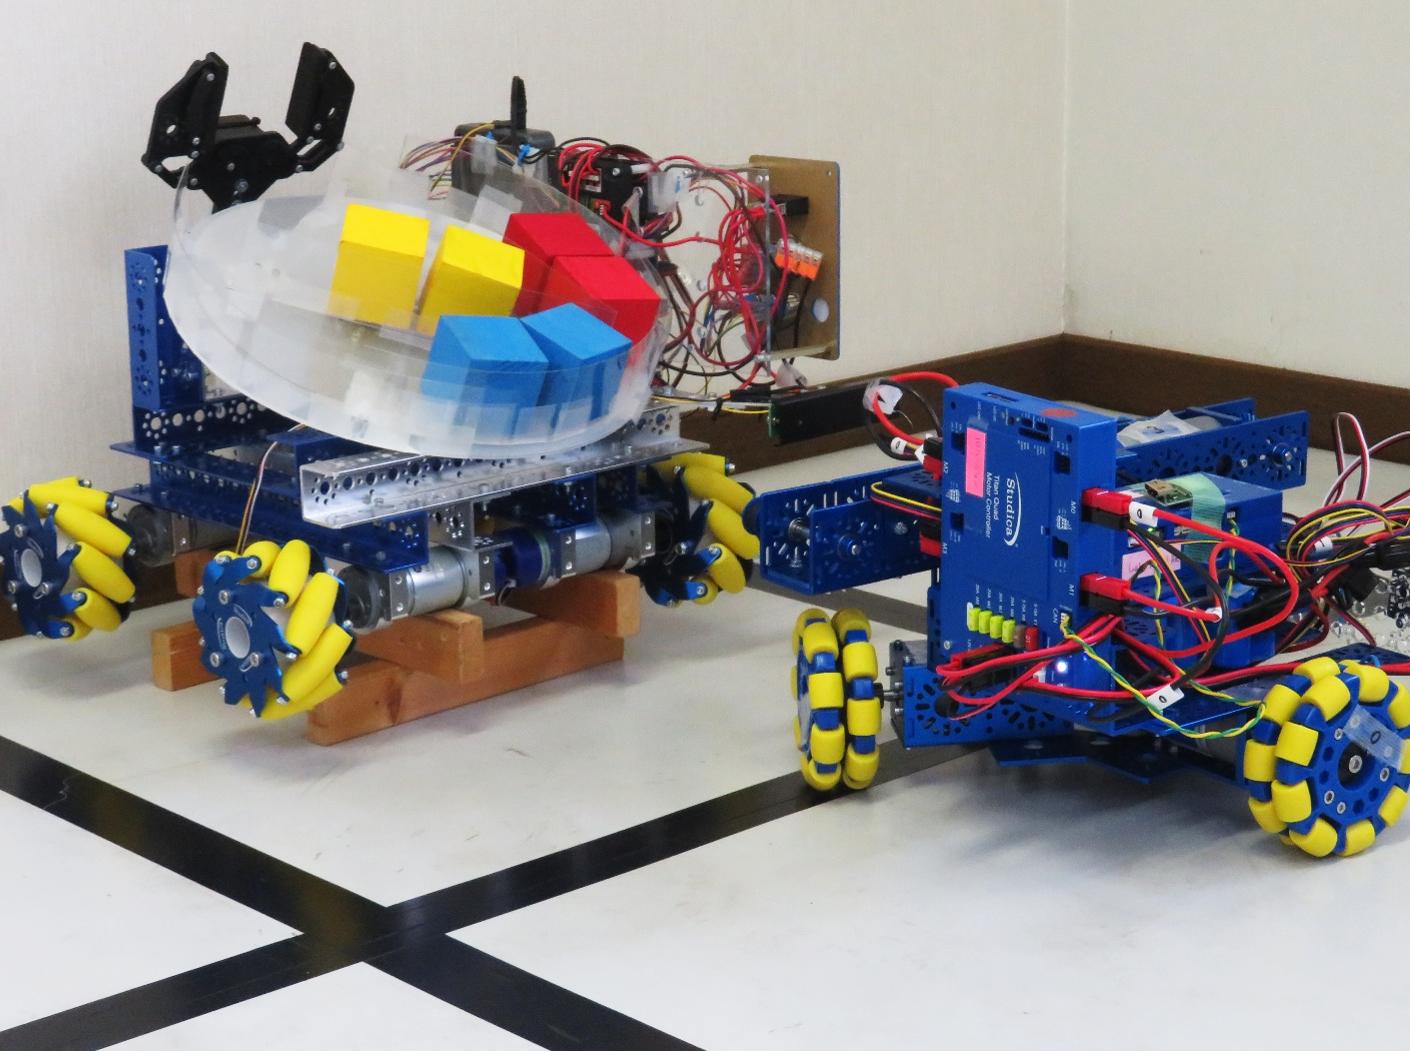 Cobra Line Follower Sensorをロボットに取り付けて走行しました!